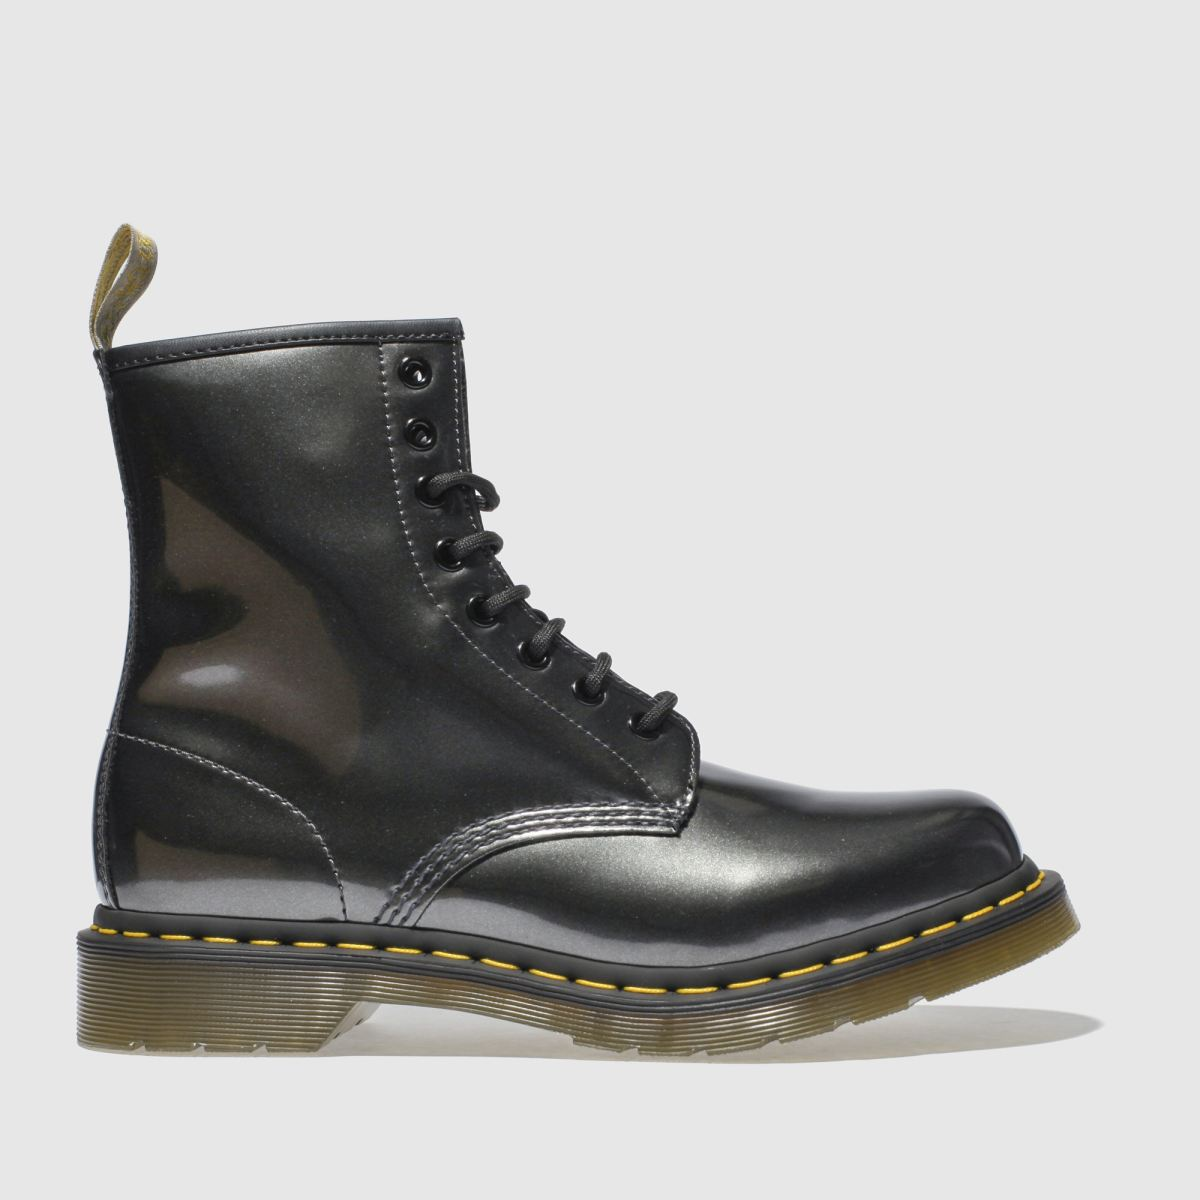 Dr Martens Dark Grey 1460 Vegan Chrome 8 Eye Boots